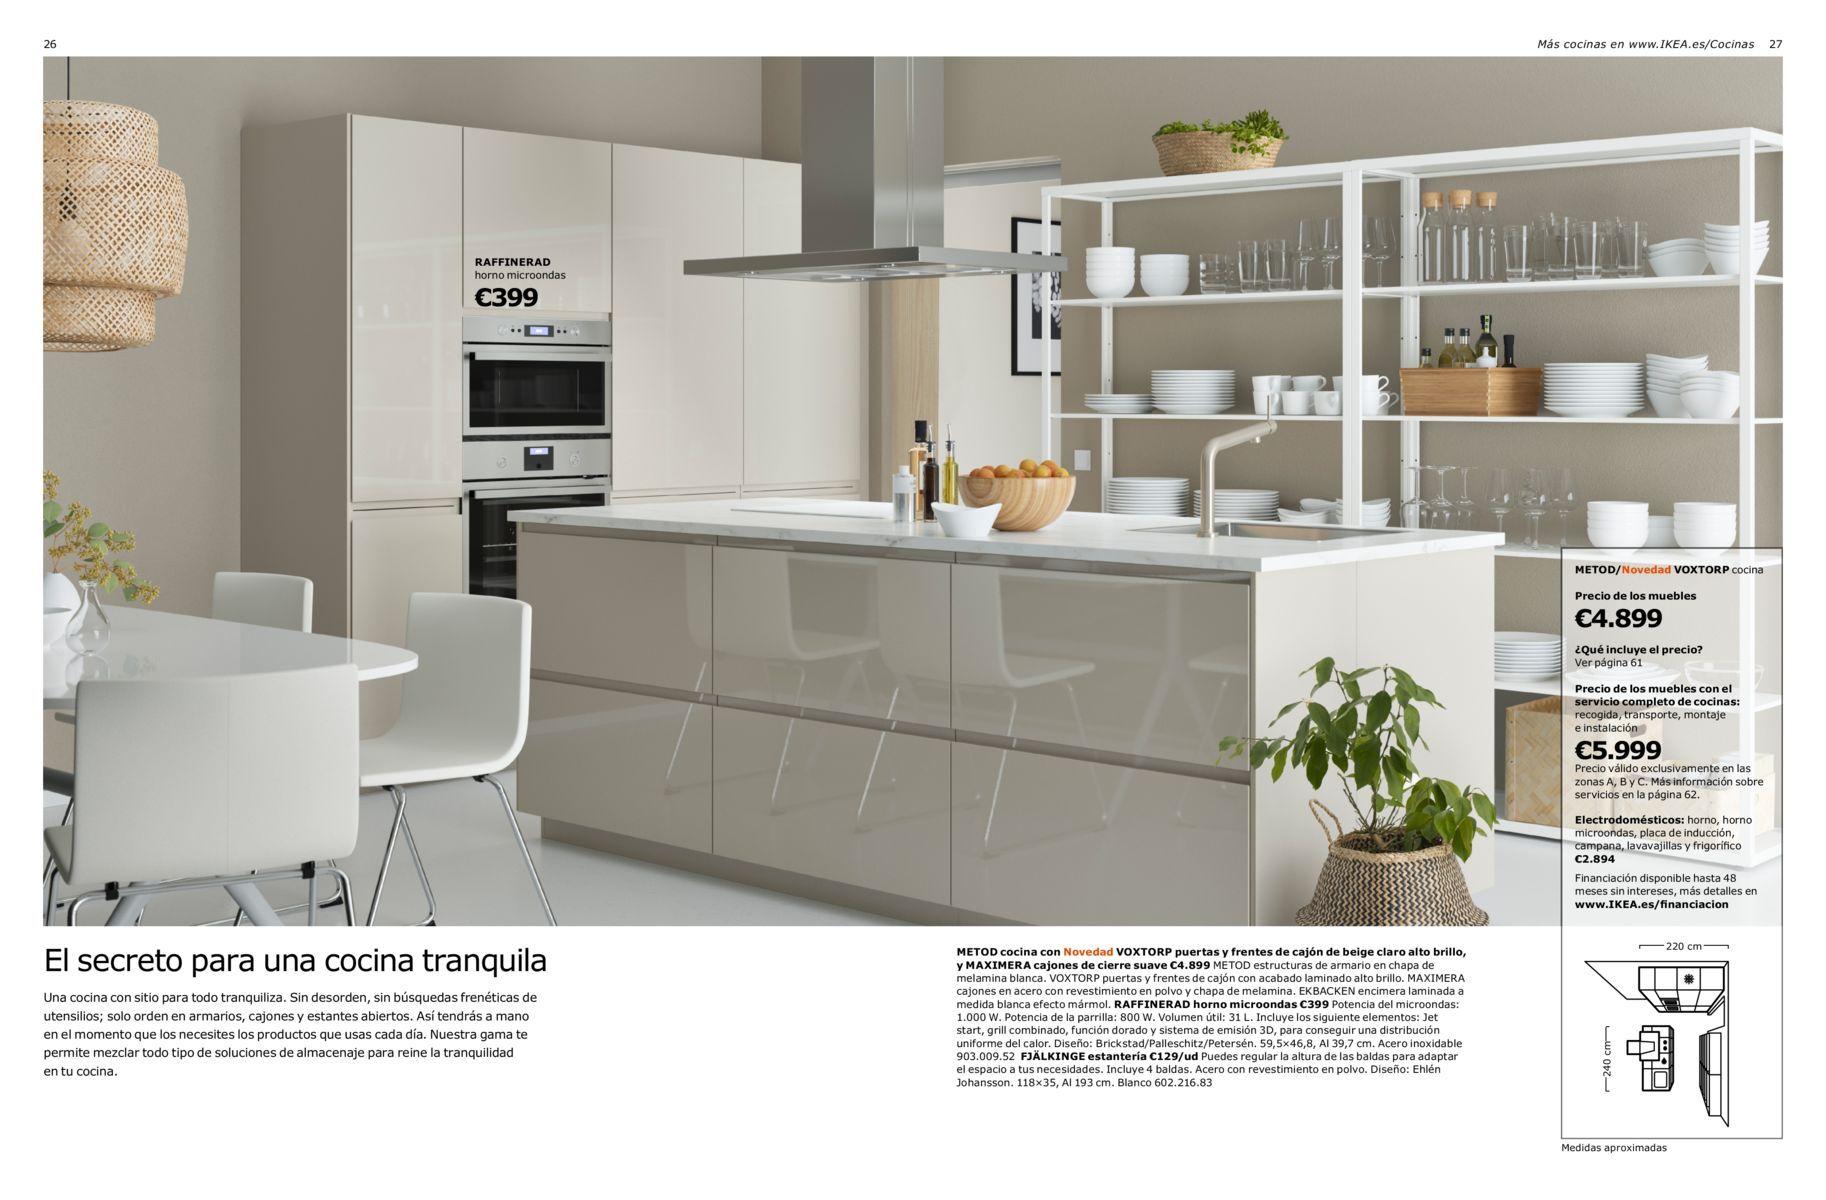 Bonito ikea muebles de cocina catalogo fotos catalogo - Ikea muebles cocina catalogo ...